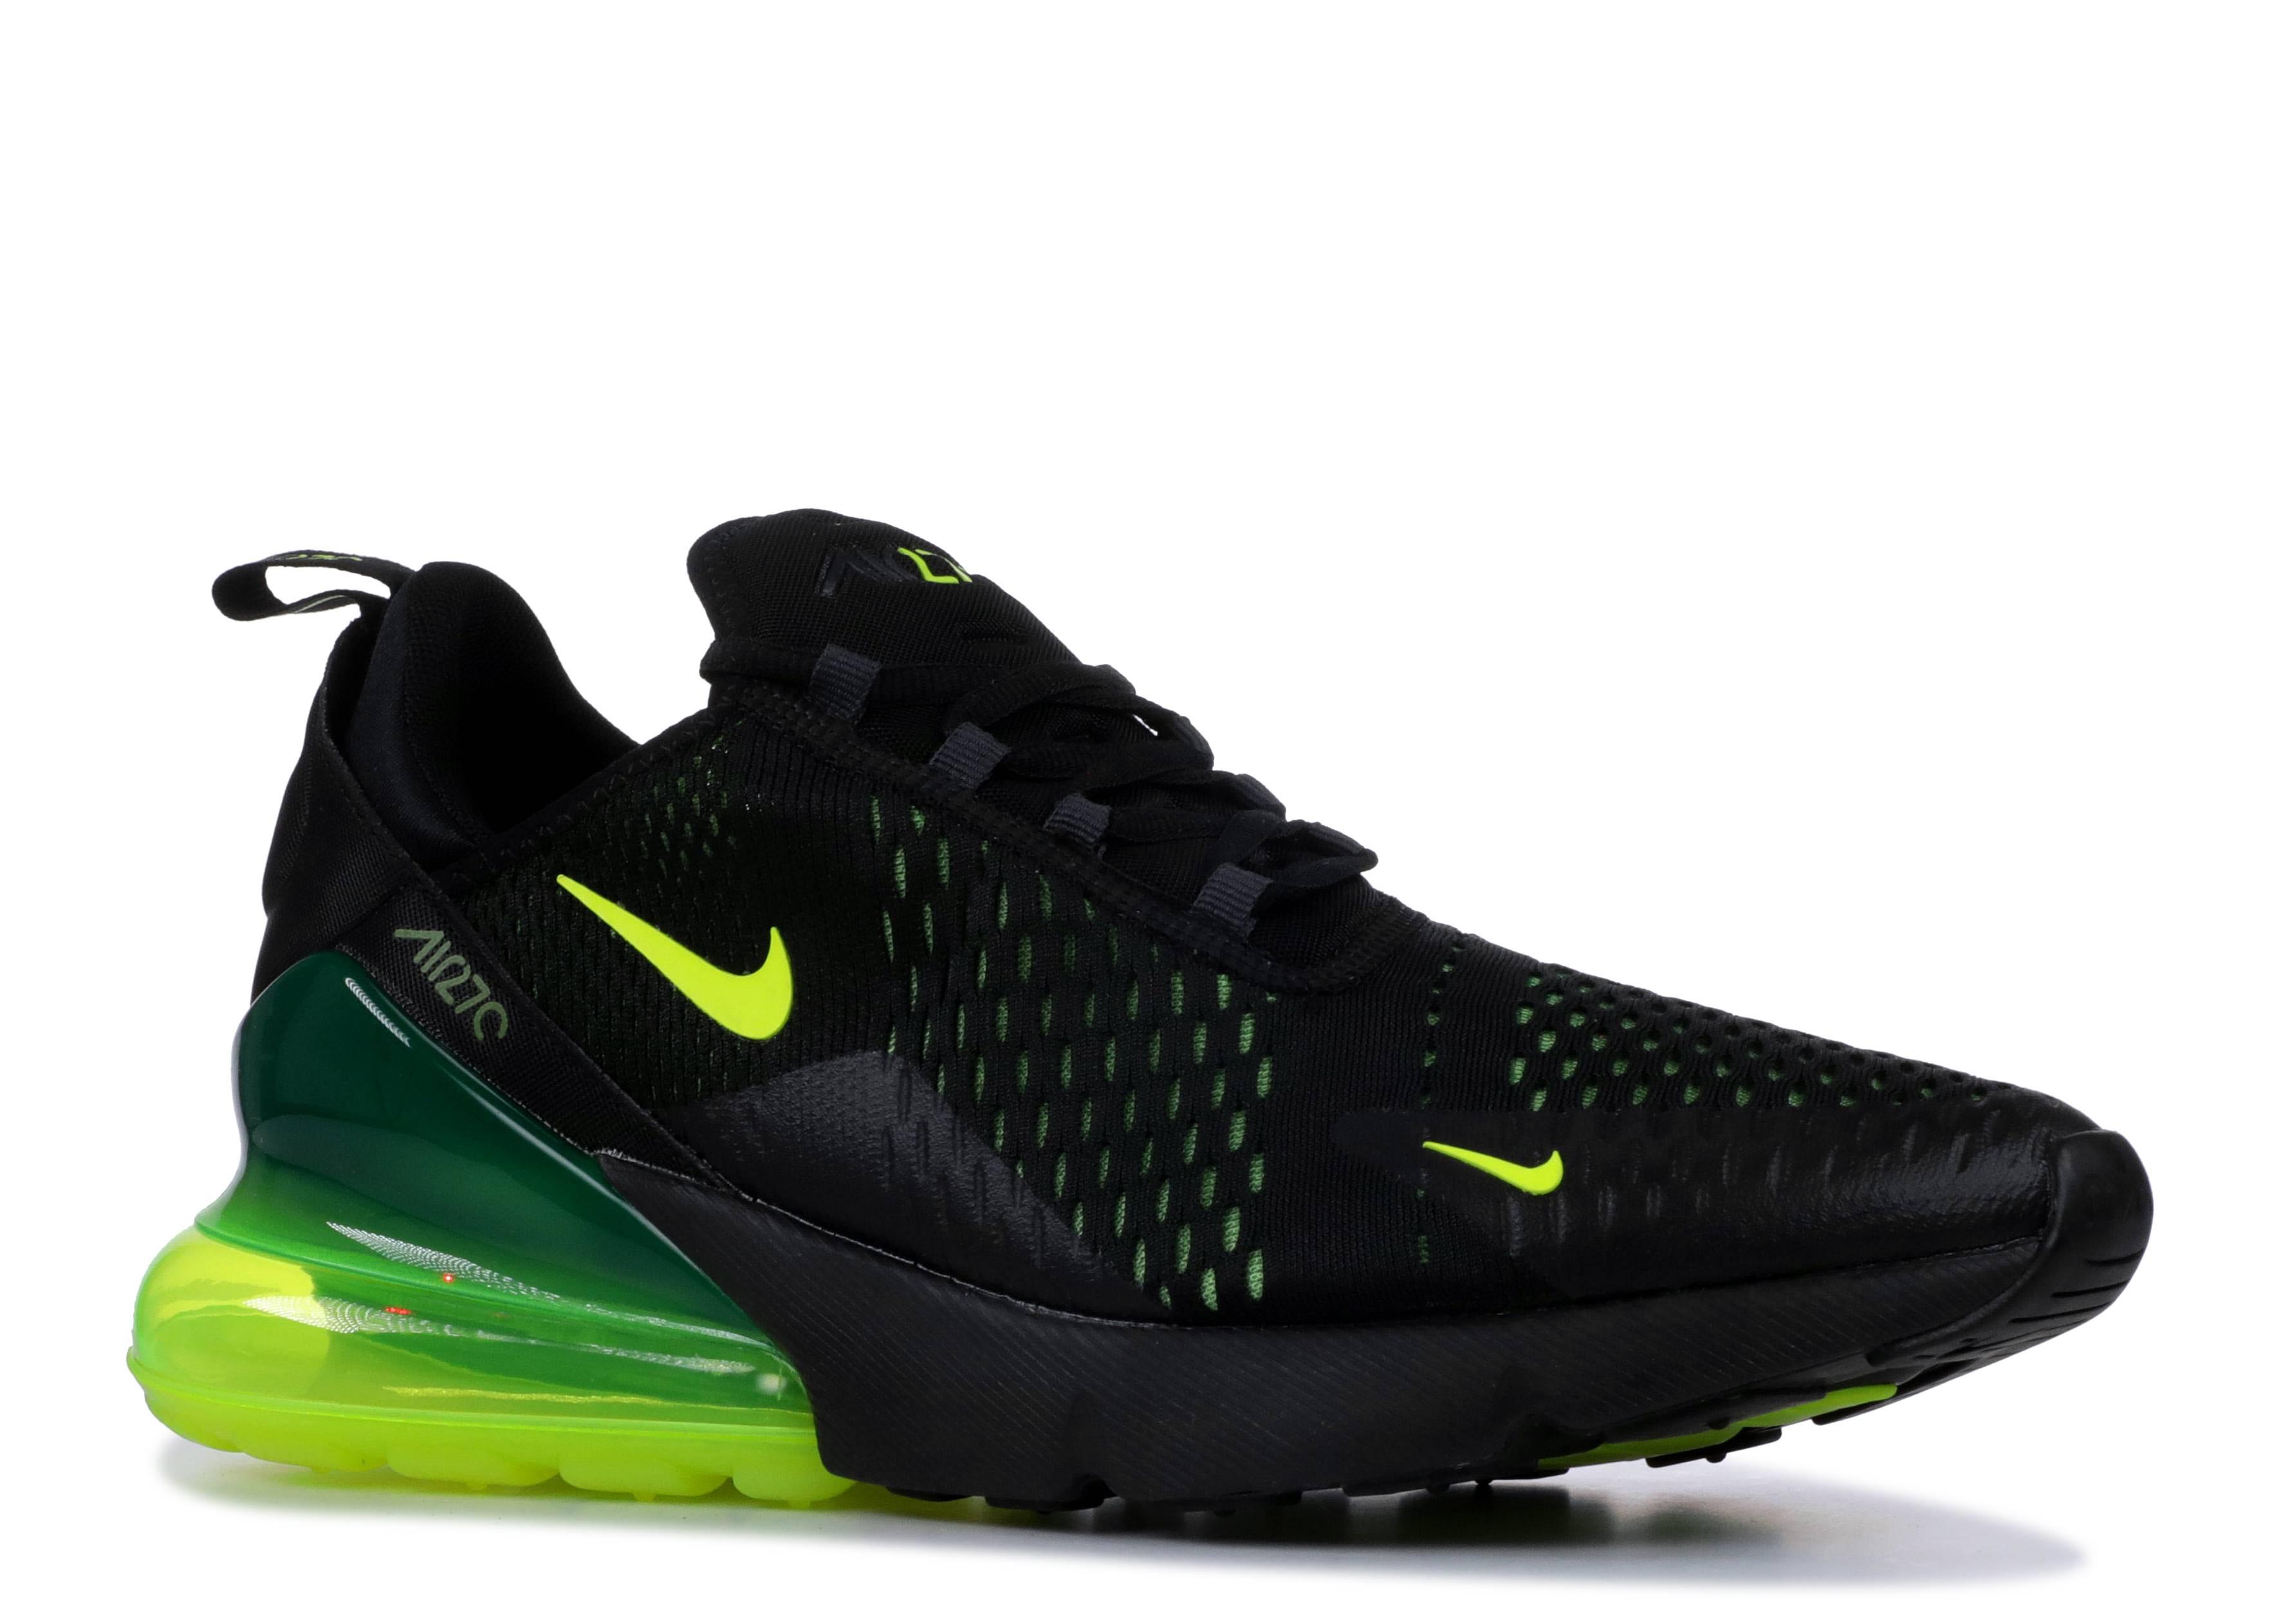 6e908b4e6ca Air Max 270 - Nike - ah8050 017 - black/volt-black-oil-grey | Flight Club